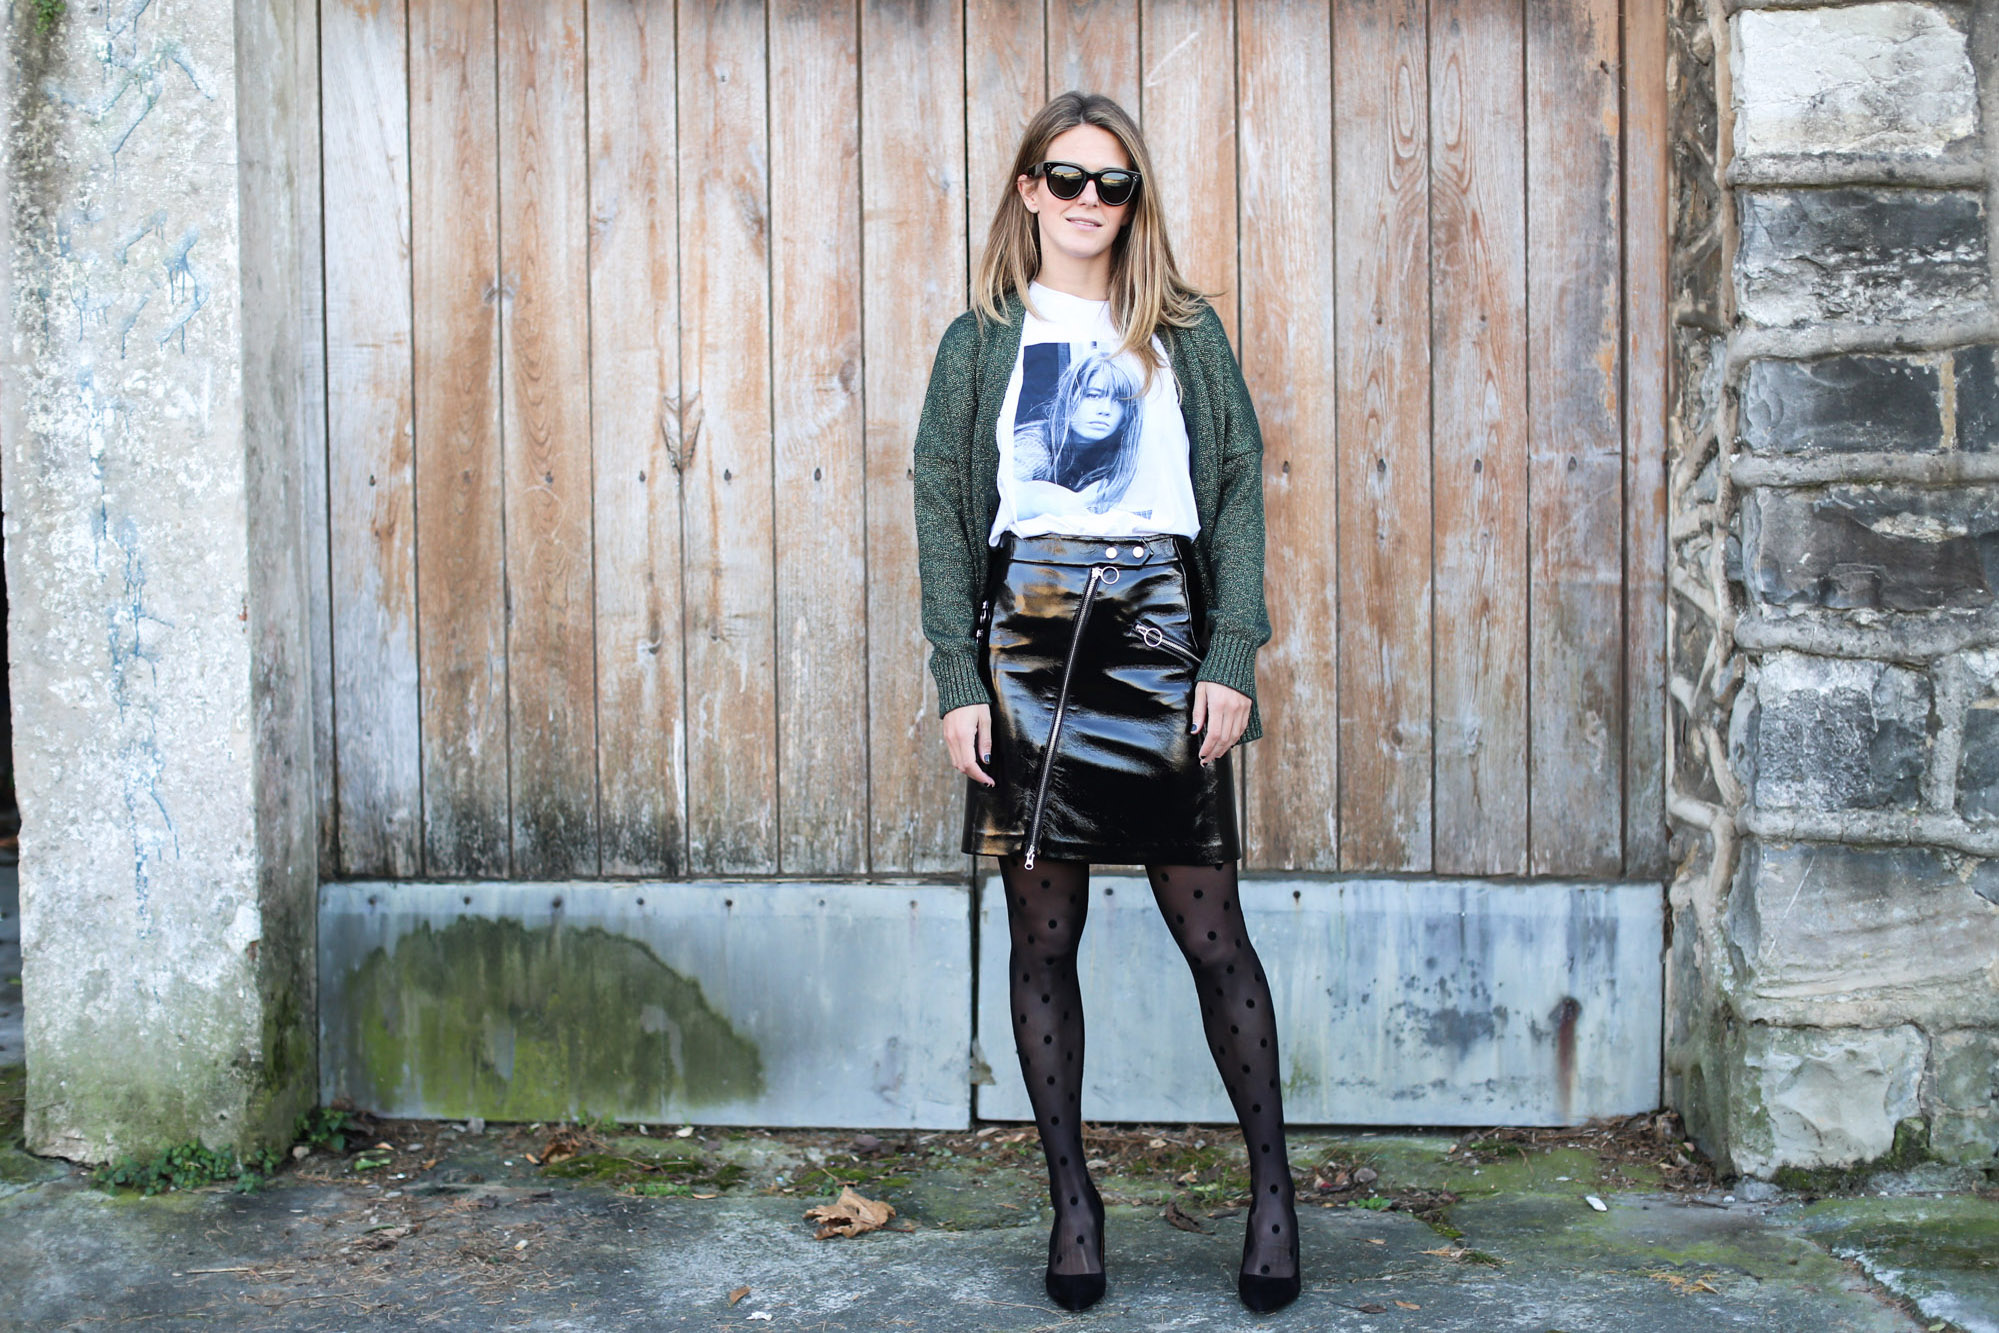 clochet_streetstyle_fashionblogger_minifaldarockeracharolzara_camiserahardypromod_abrigolargolanacos-4